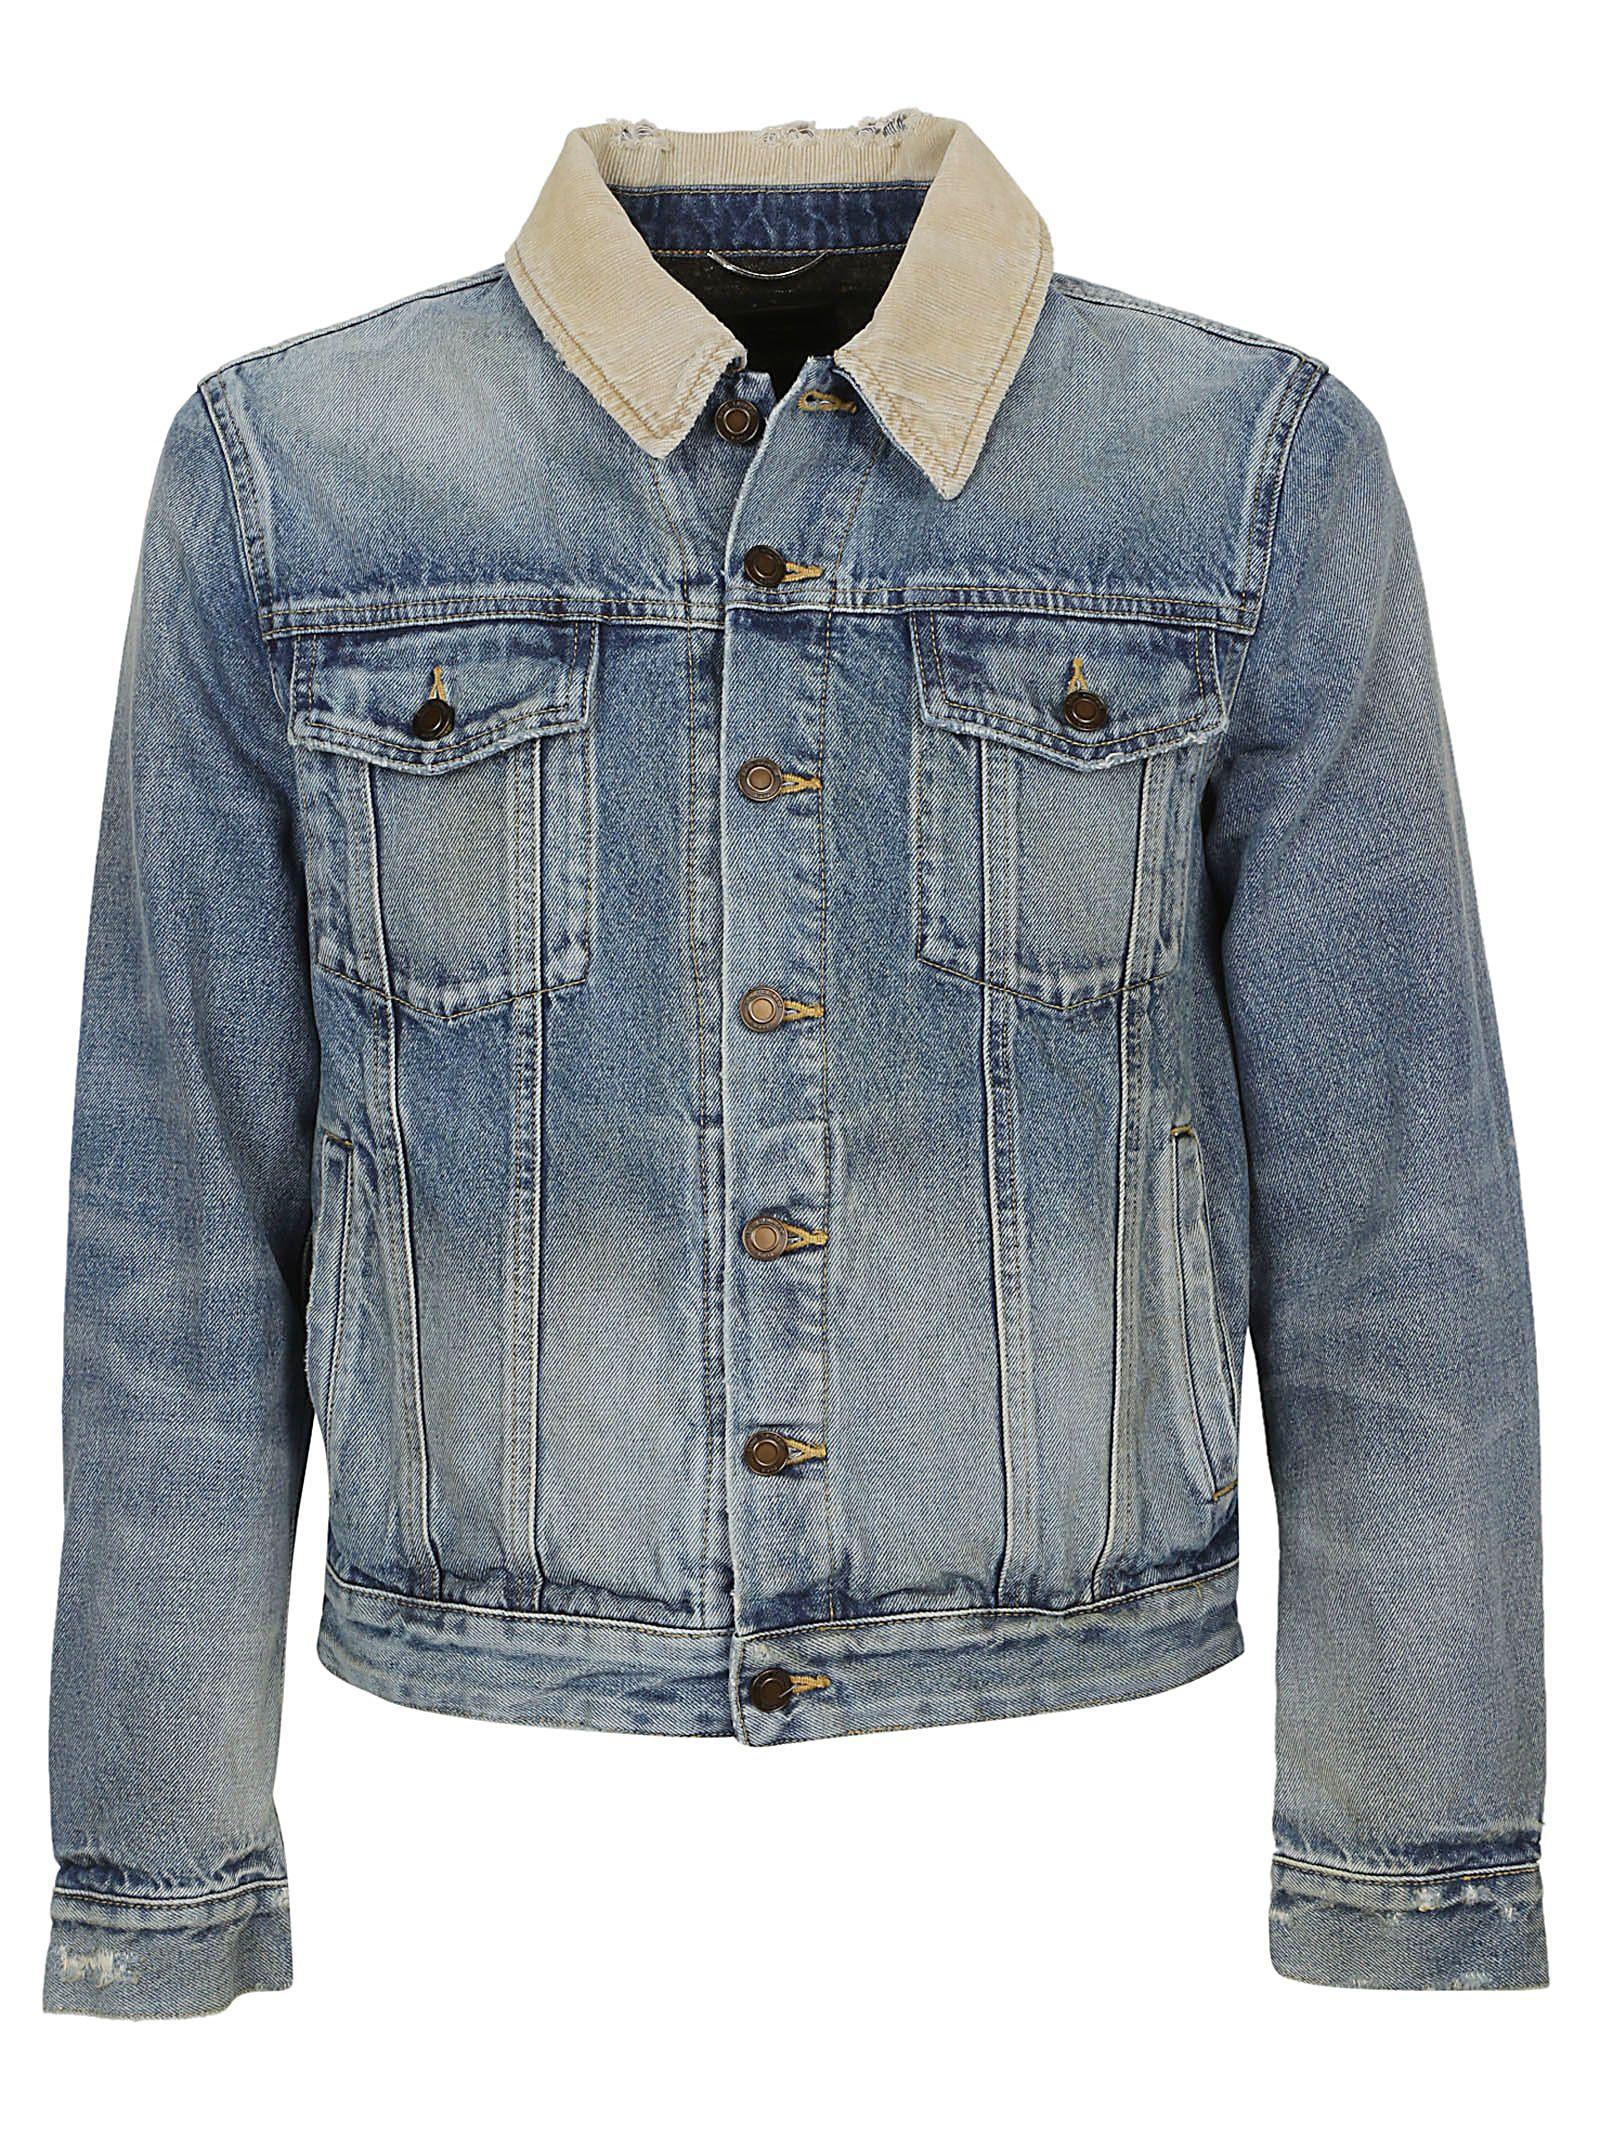 0d83b80509 Saint Laurent Corduroy Collar Denim Jacket Rusty Light Blue | ModeSens